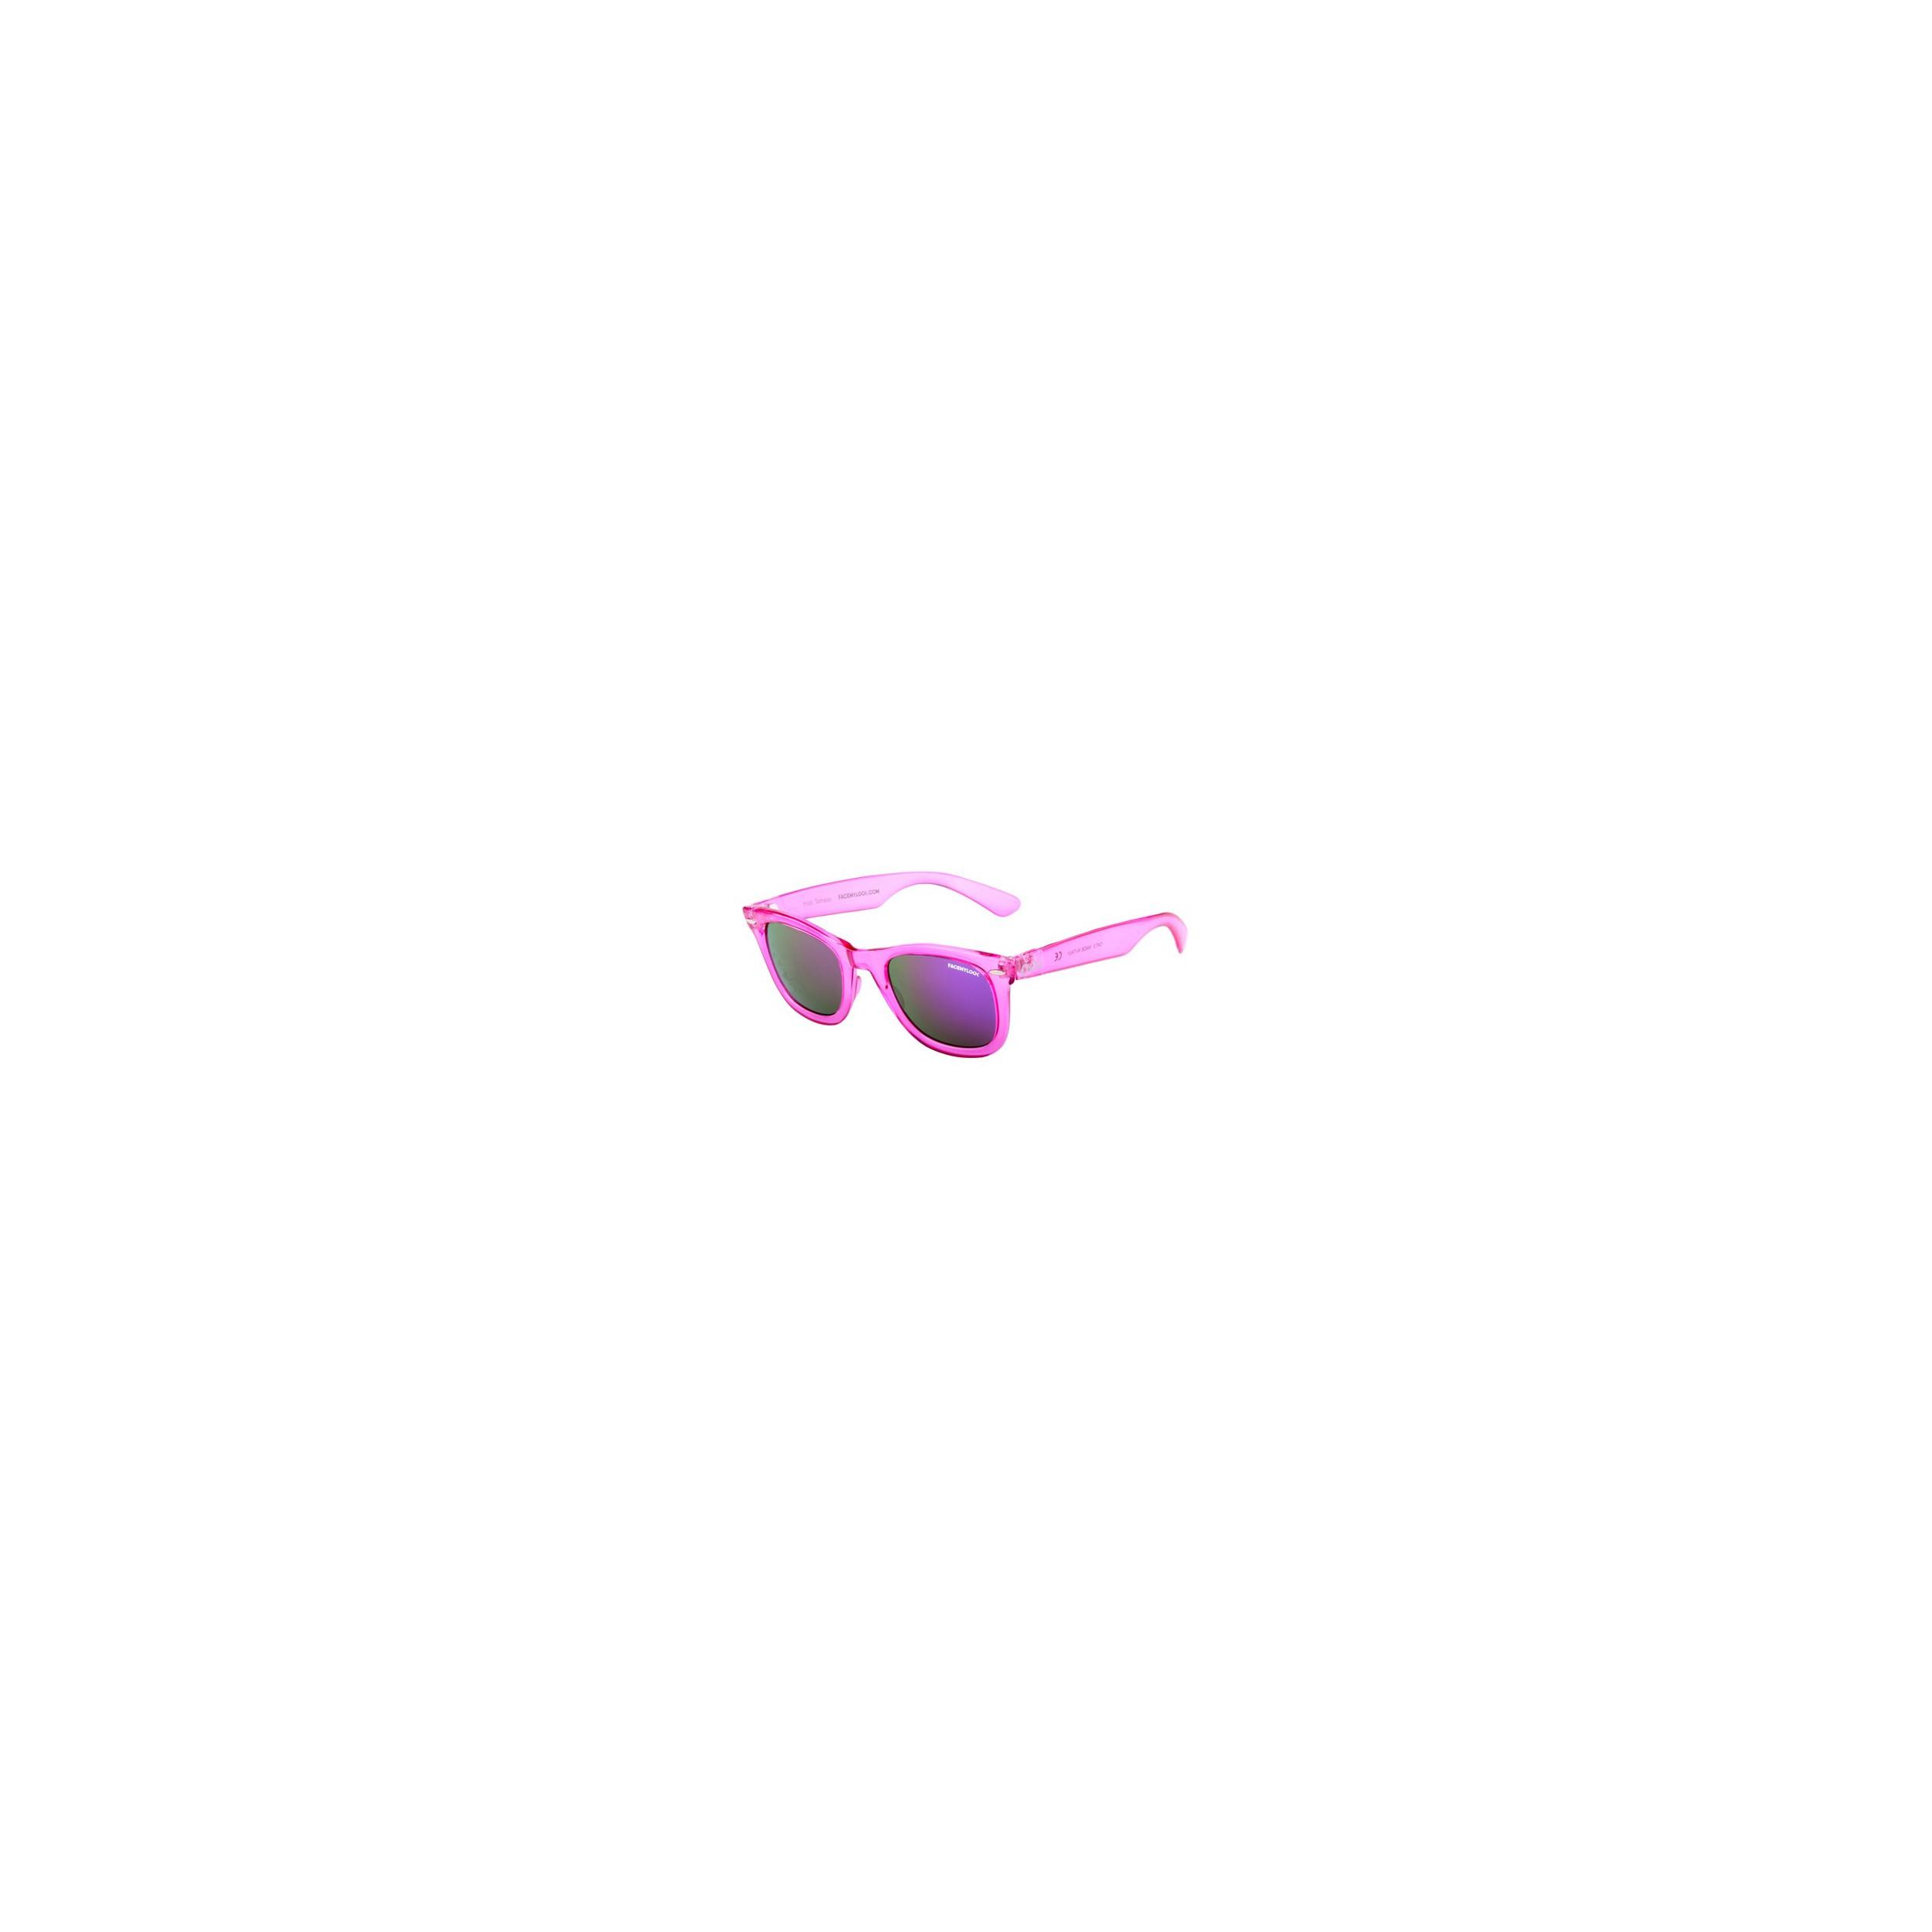 688e034a9 Facemylook | Sunglasses Tomaso-candy fuchsia - Category Tomaso